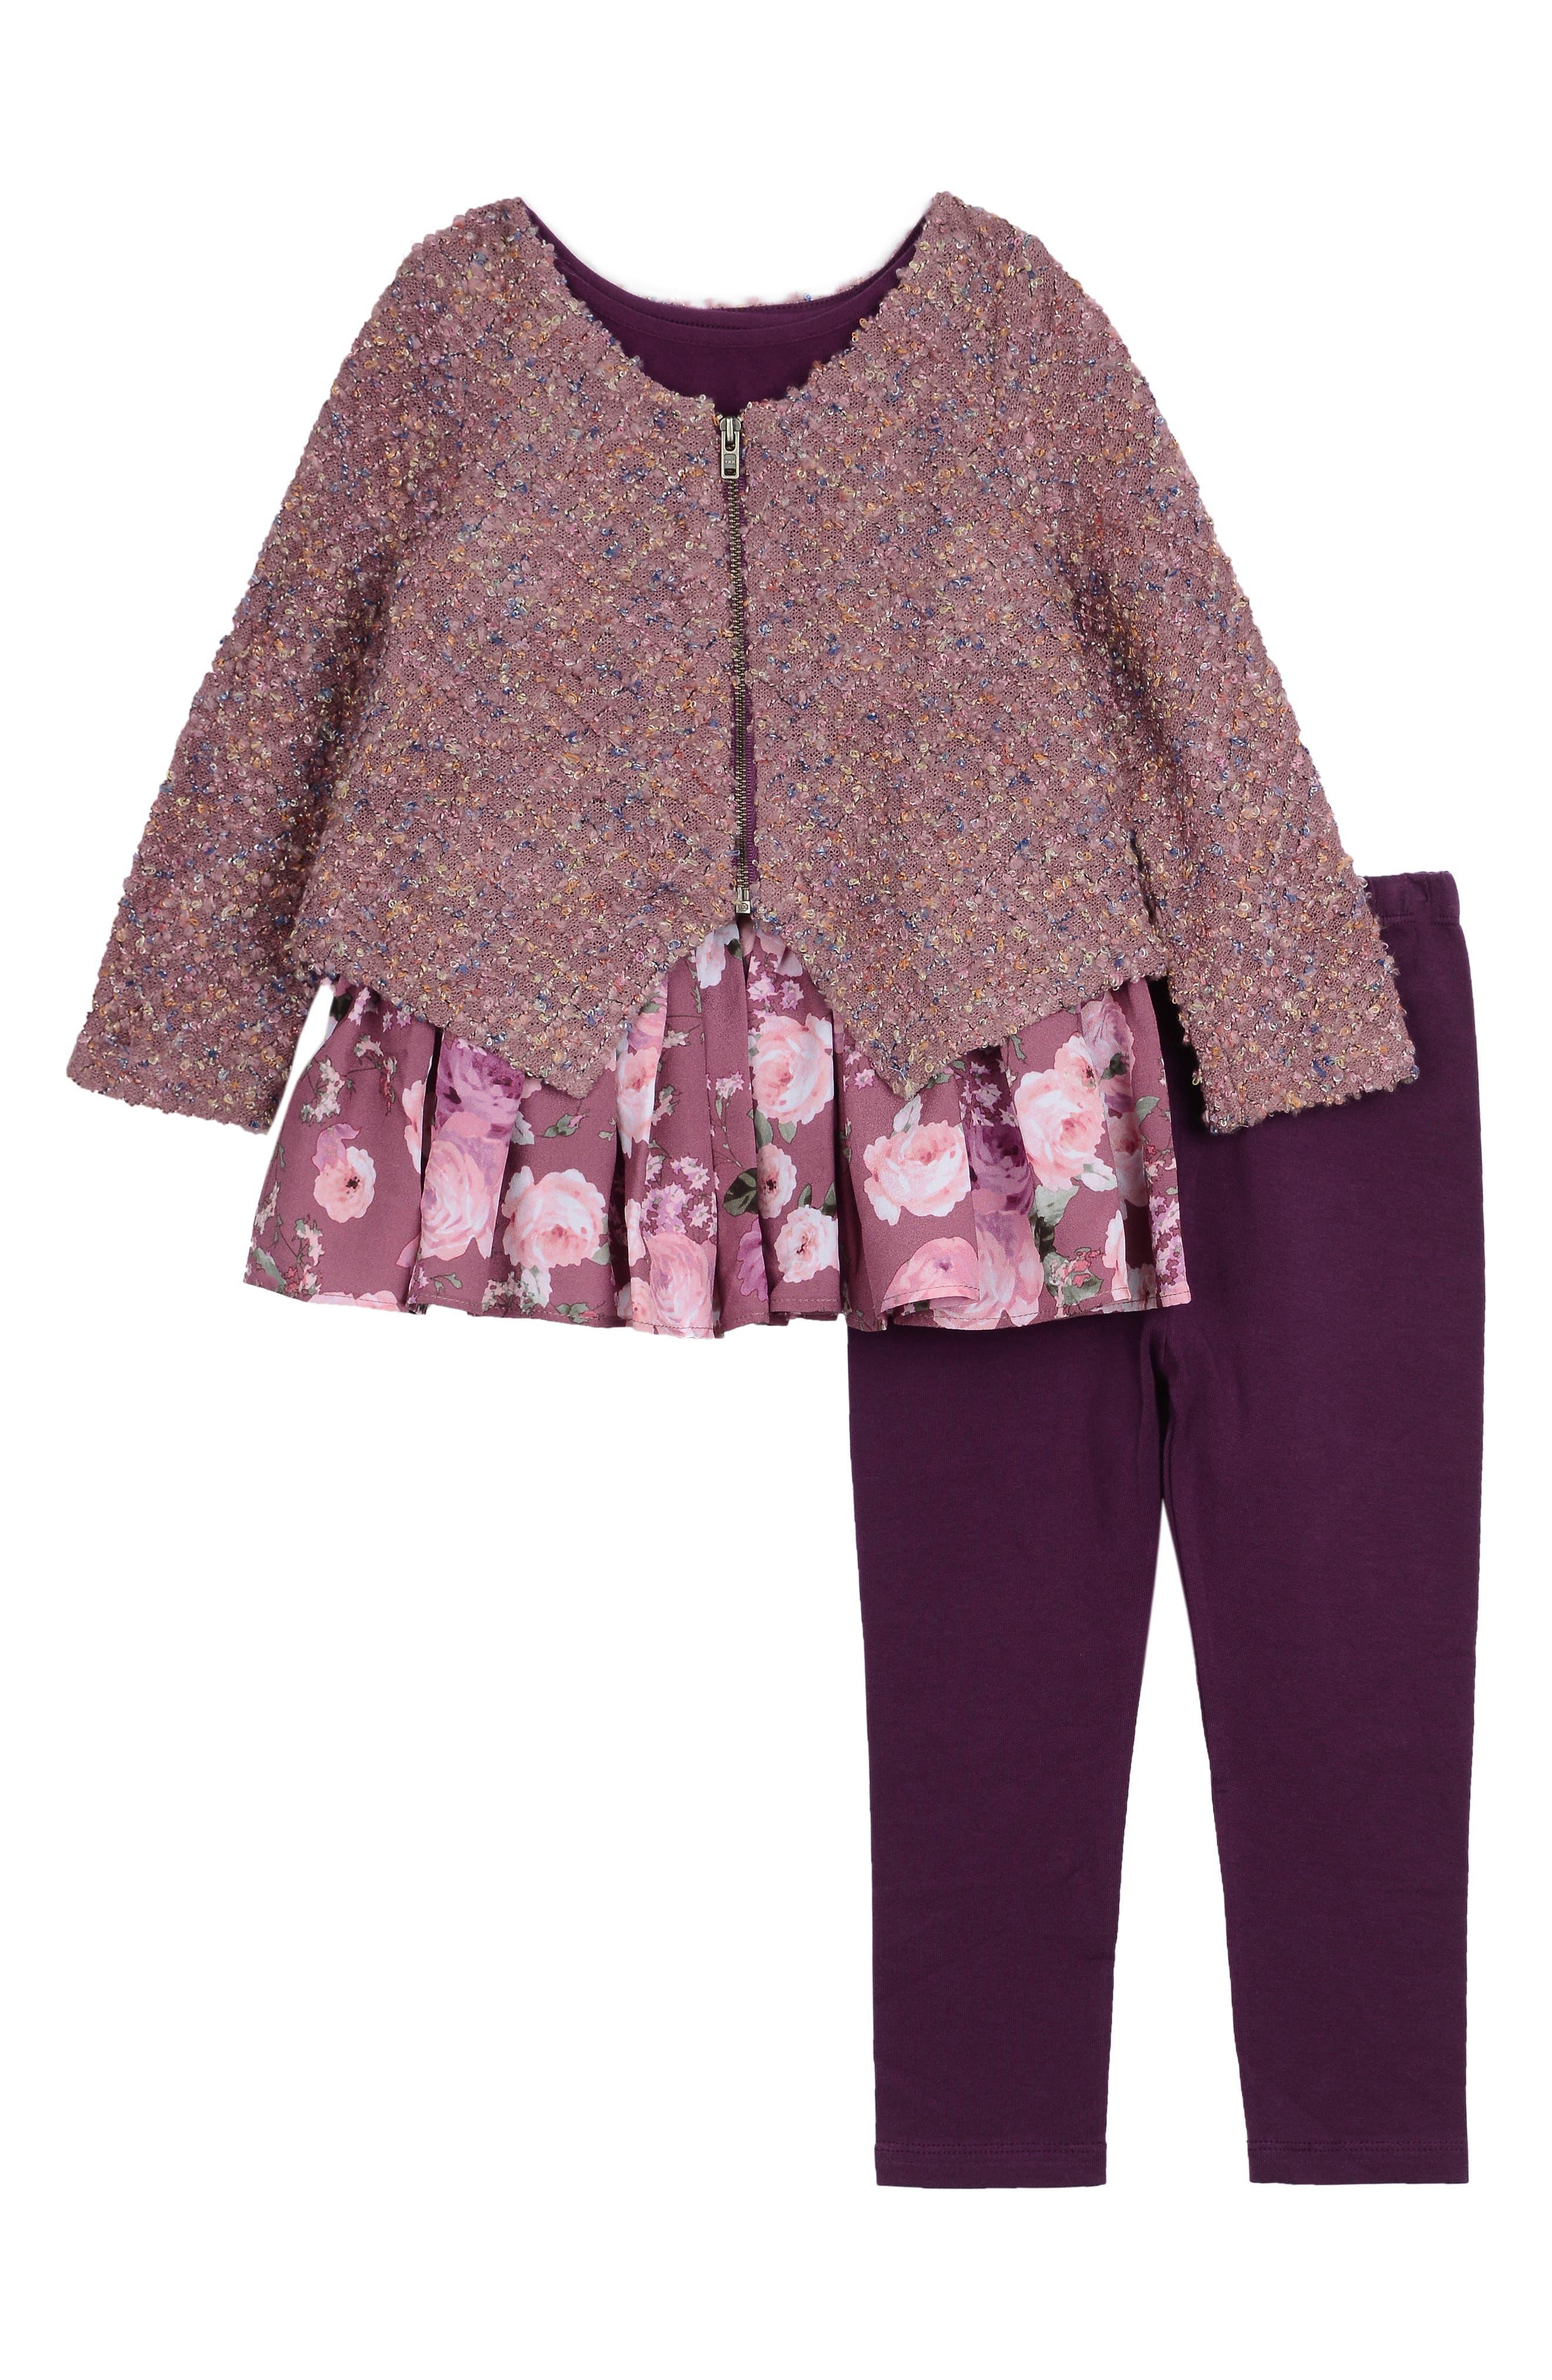 PIPPA & JULIE Cardigan, Tunic & Leggings Set, Main, color, WINE